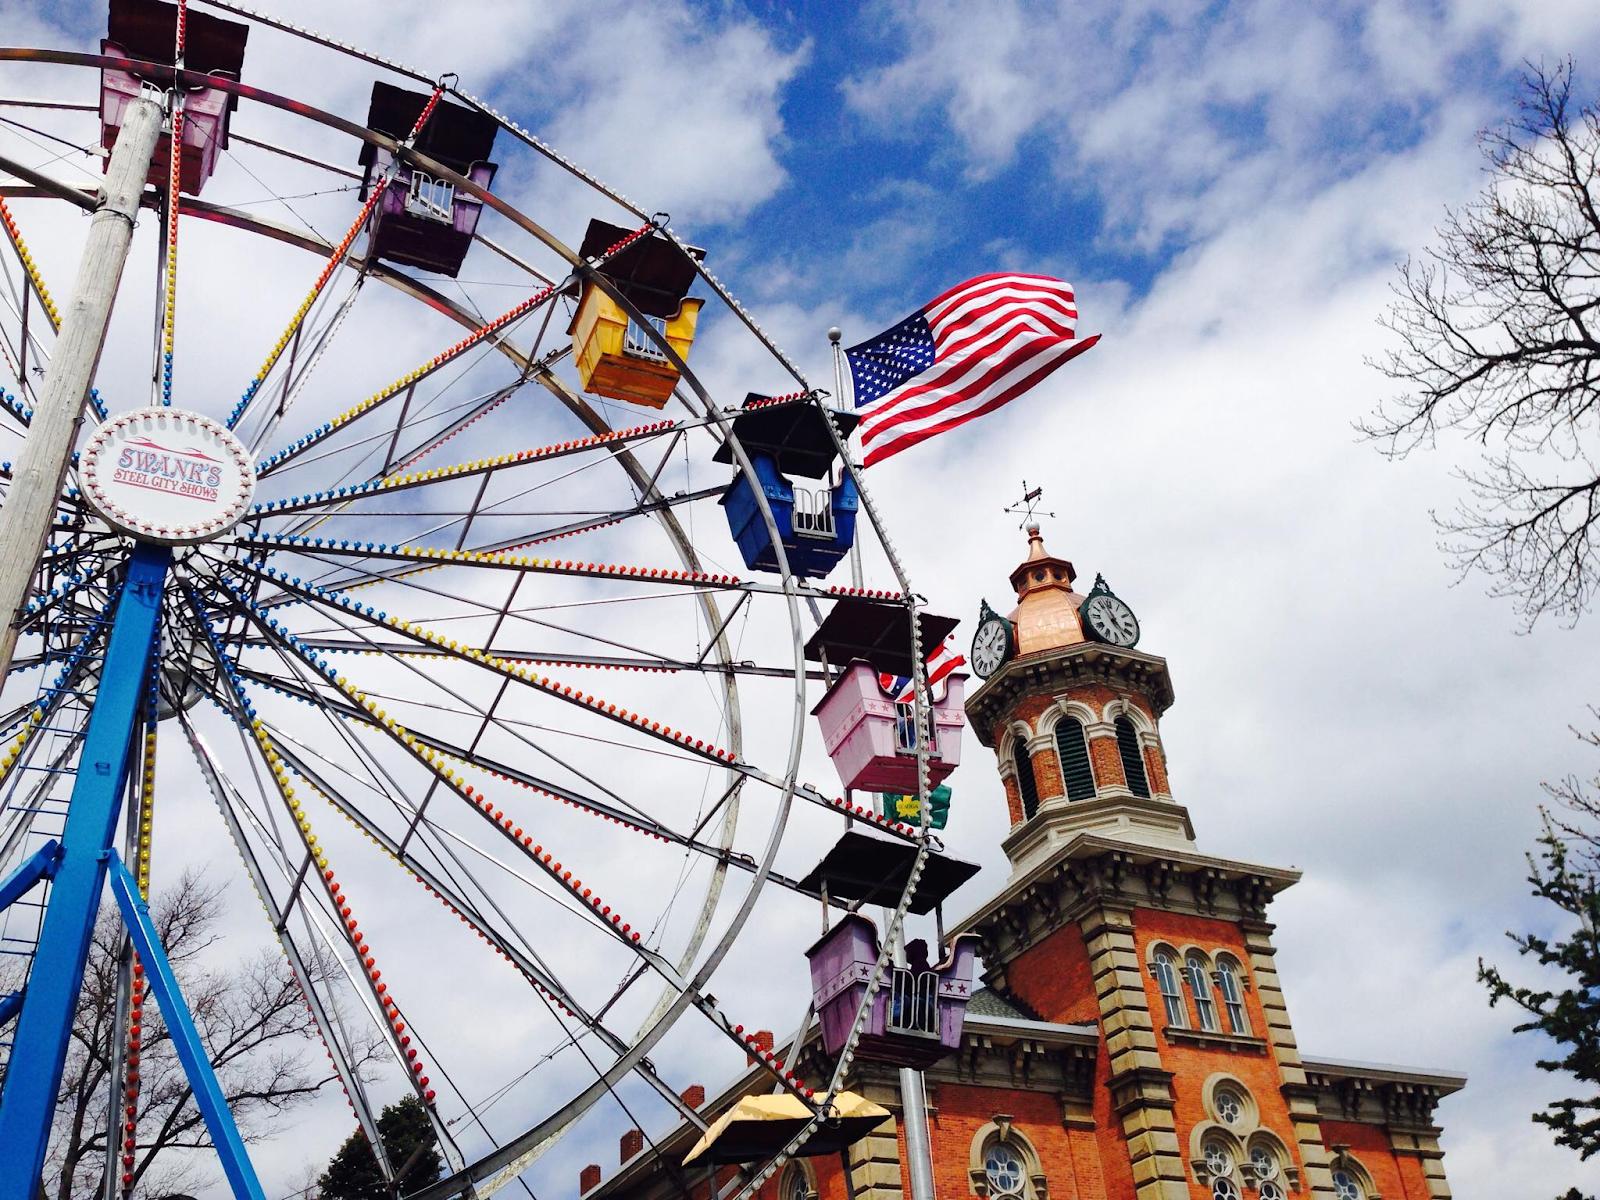 Ferris wheel in Geauga County Maple Festival